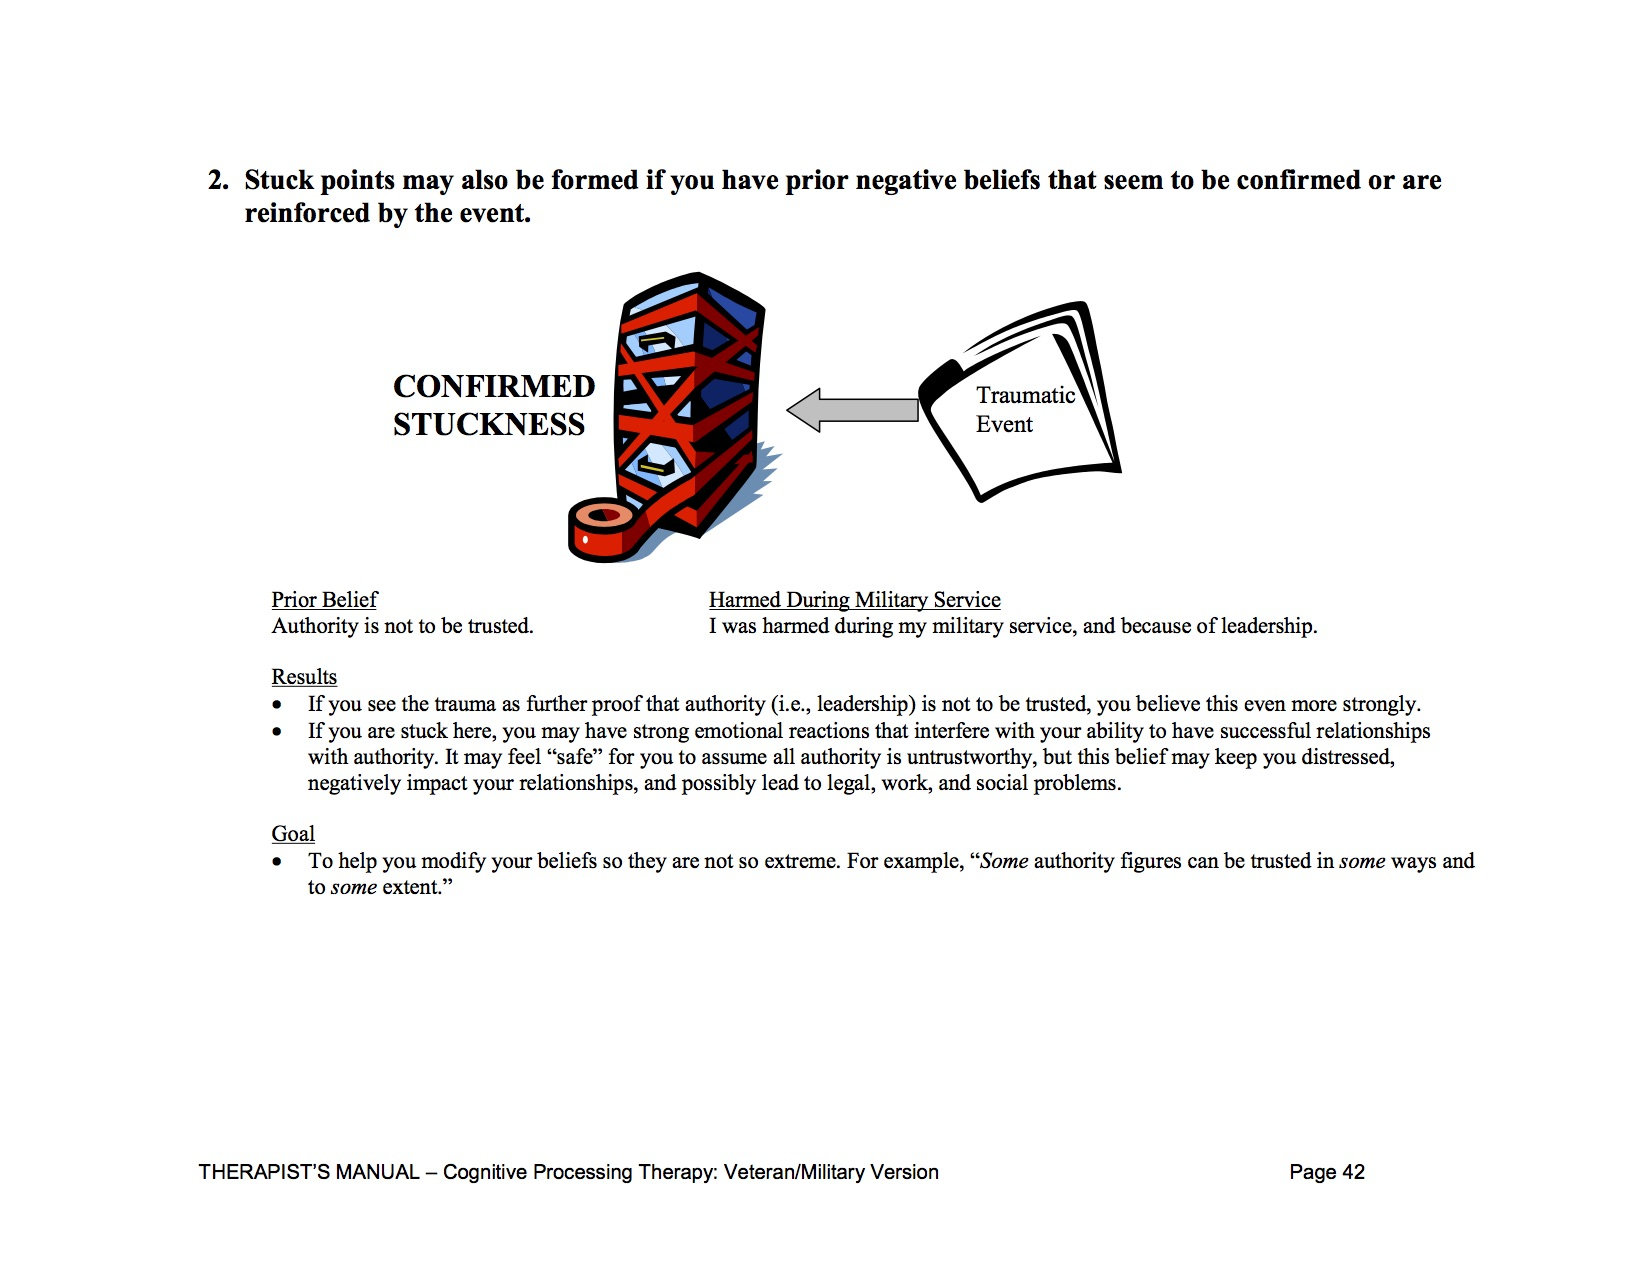 Helpful Info On Stuck Points